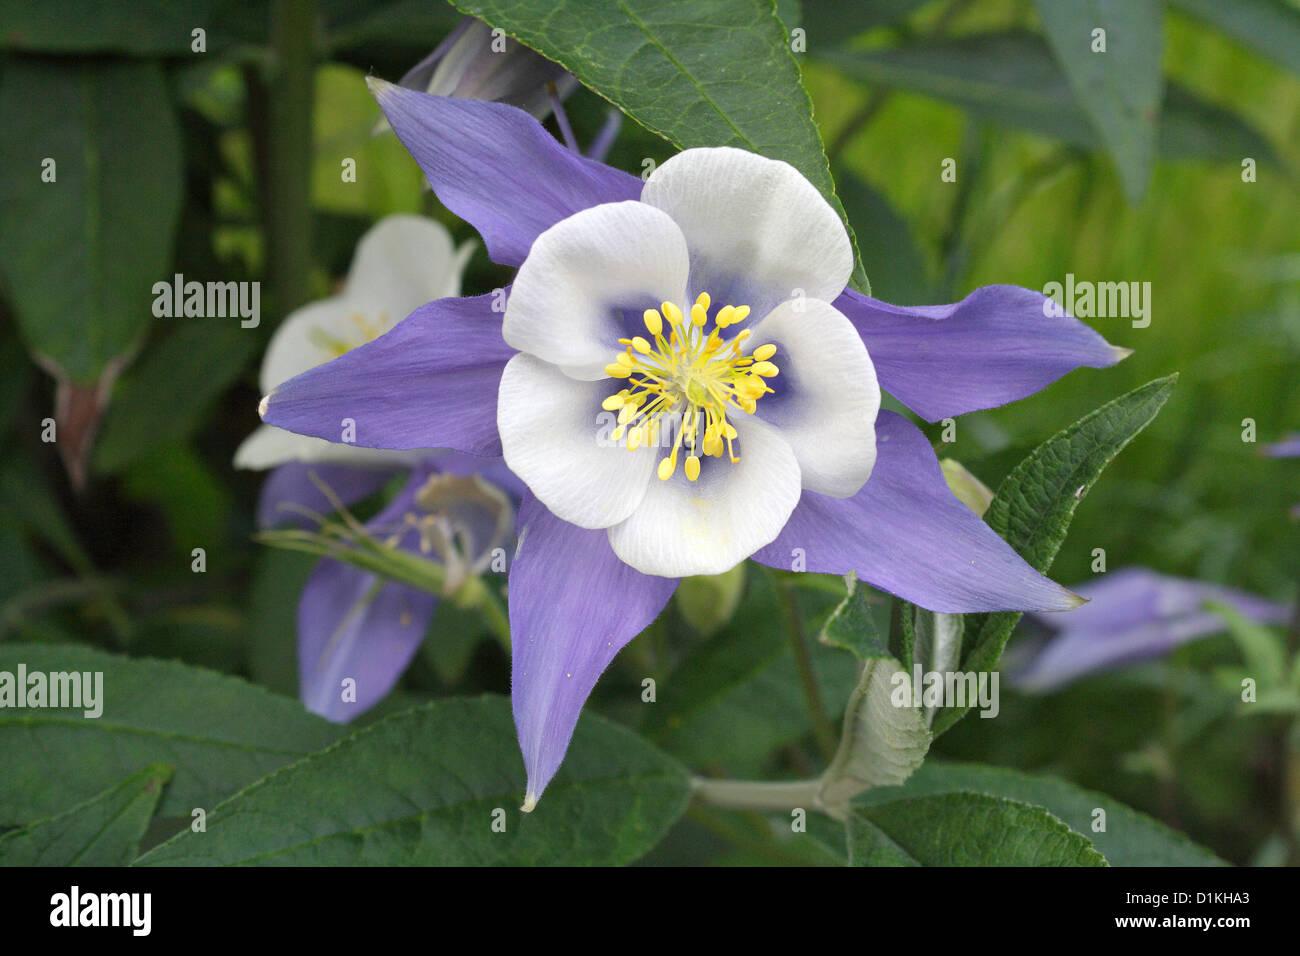 The blue columbine flower stock photo 52676459 alamy the blue columbine flower izmirmasajfo